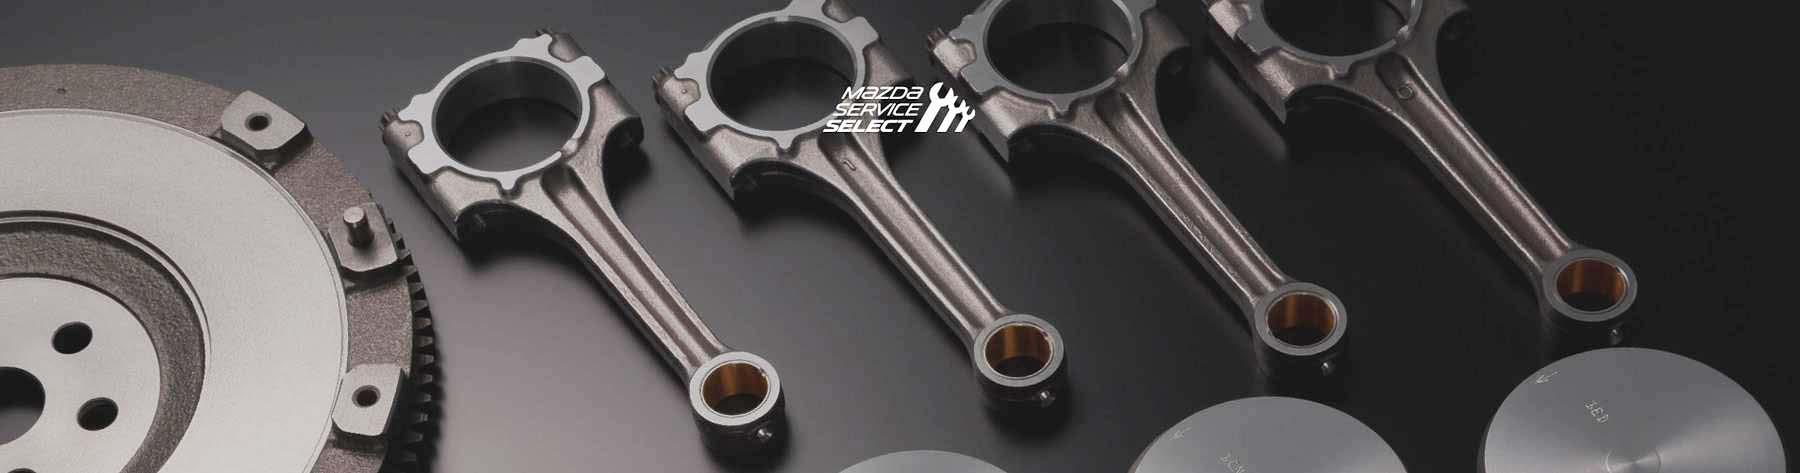 Mazda servicing